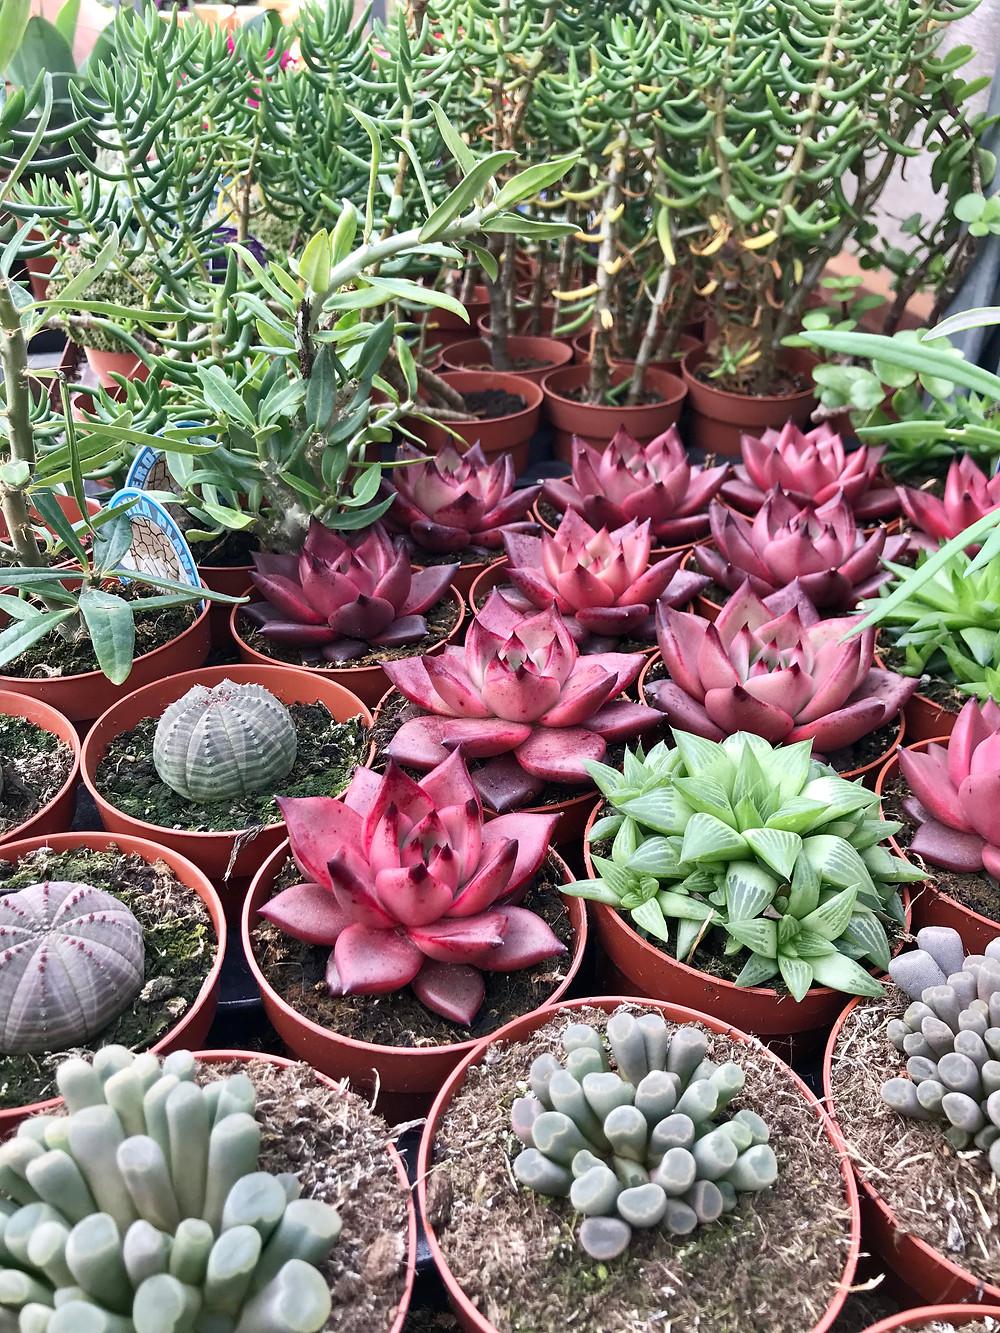 https://cactus-nijar.negocio.site